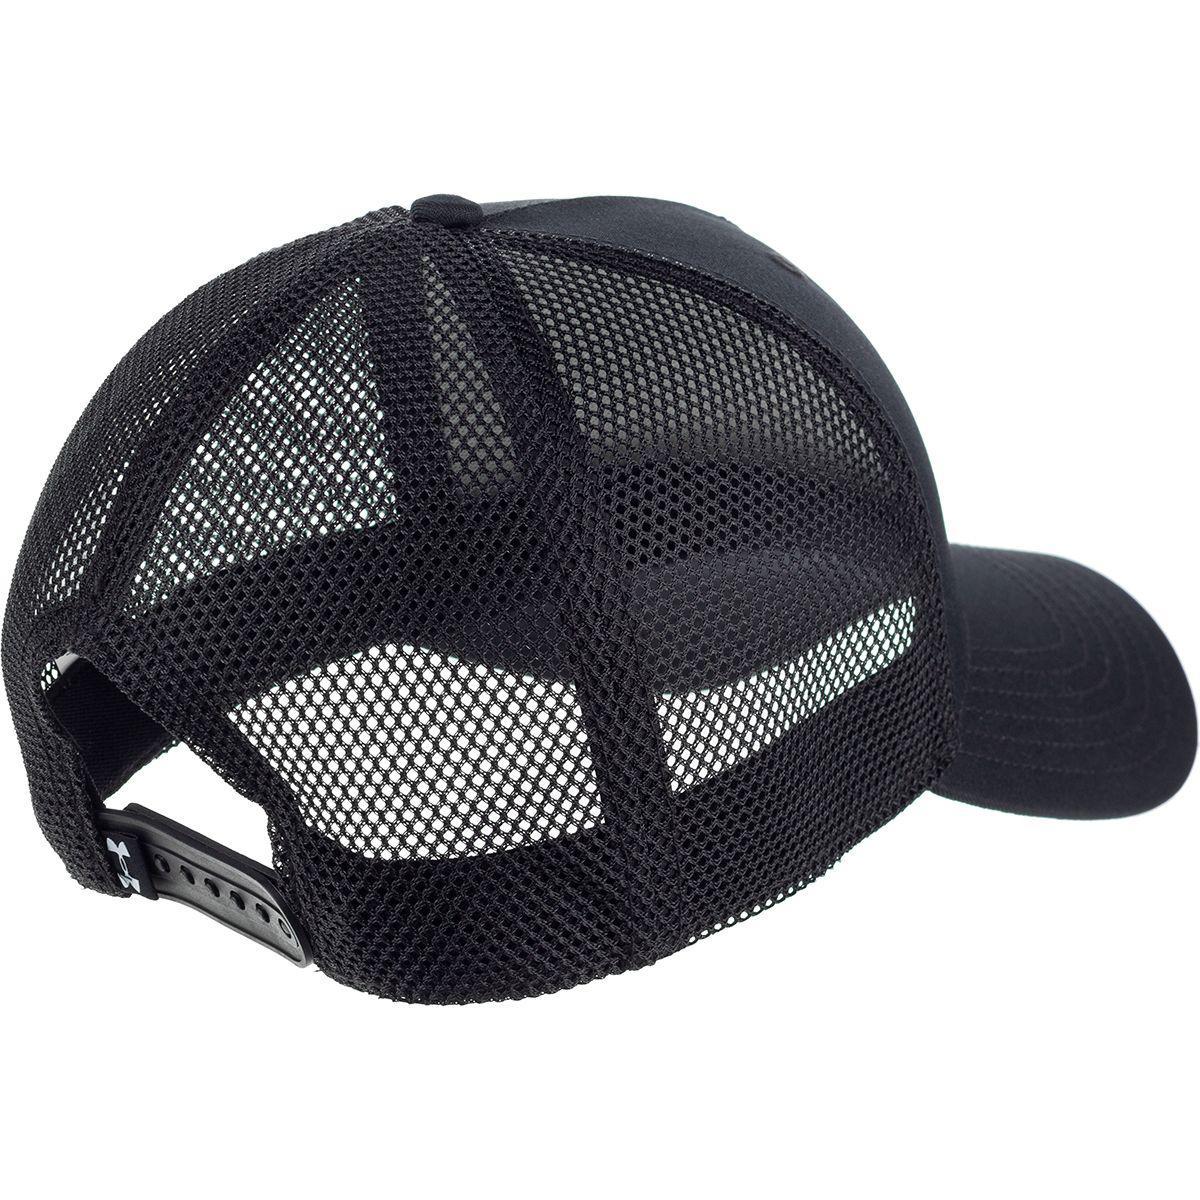 4055c1b7b91 Lyst - Under Armour Outdoor Performance Trucker Hat in Black for Men